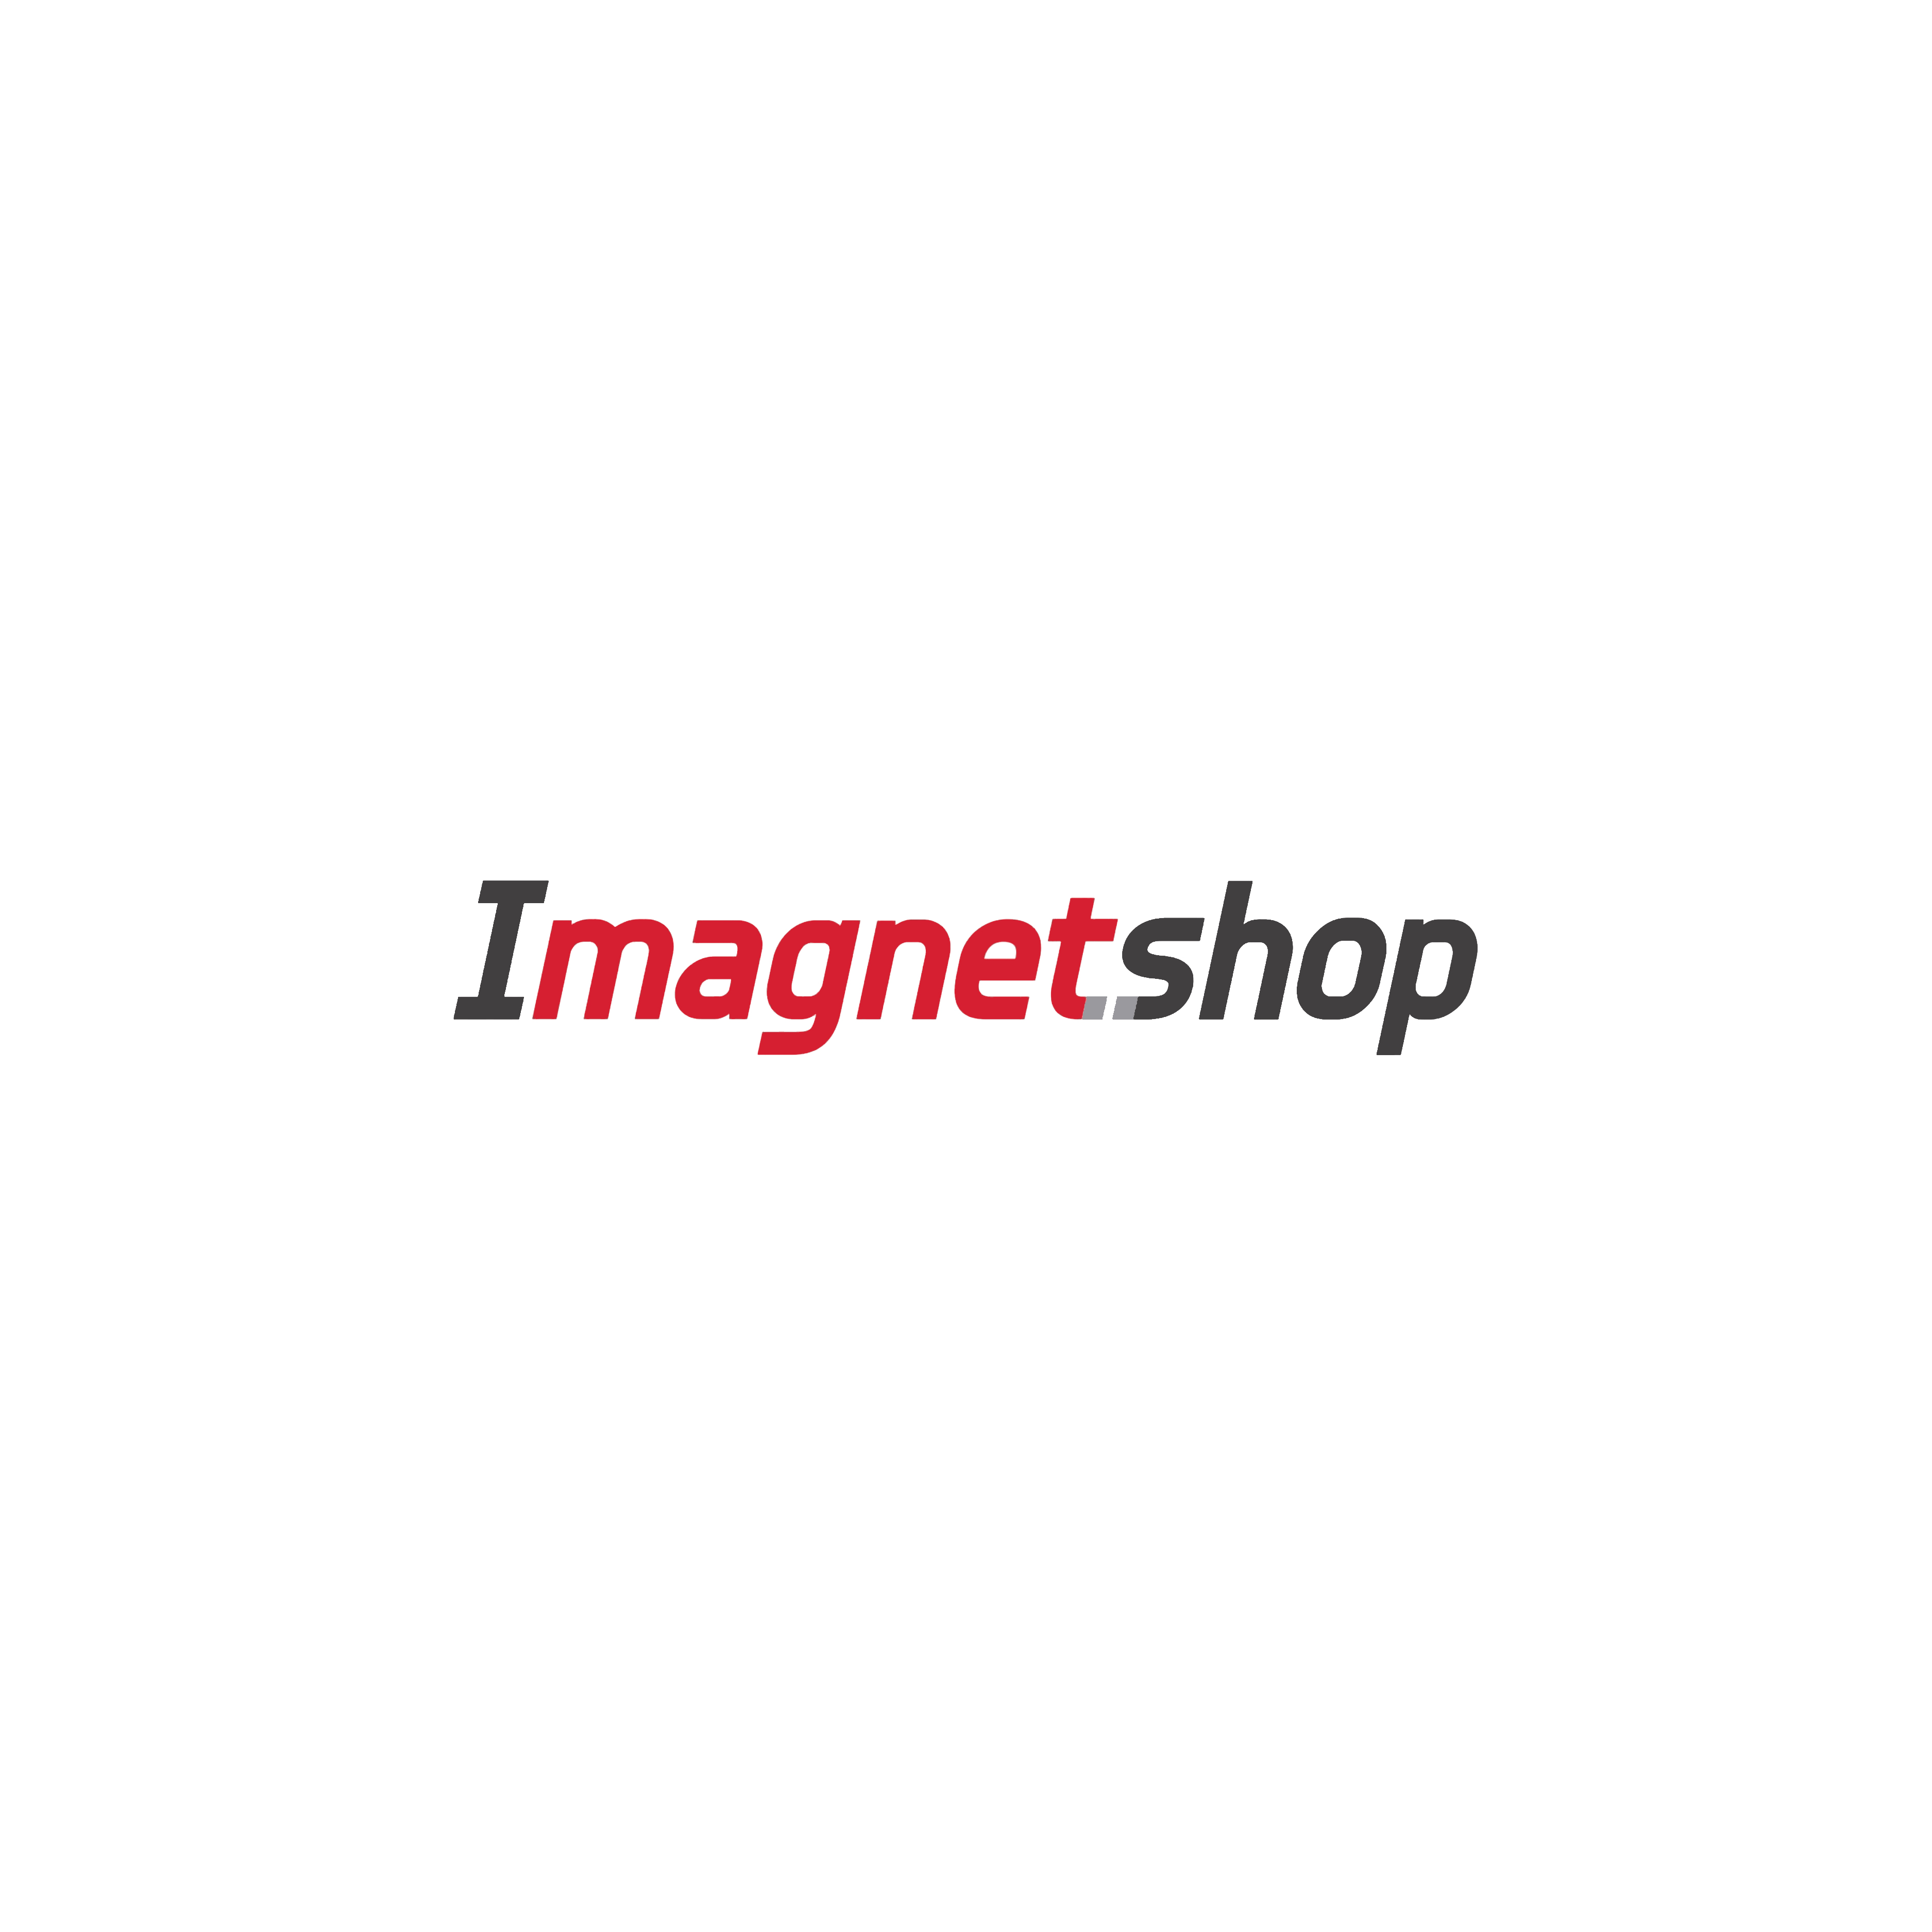 Casos éxito etlinebcn_web_imagnet-shop_portada-01